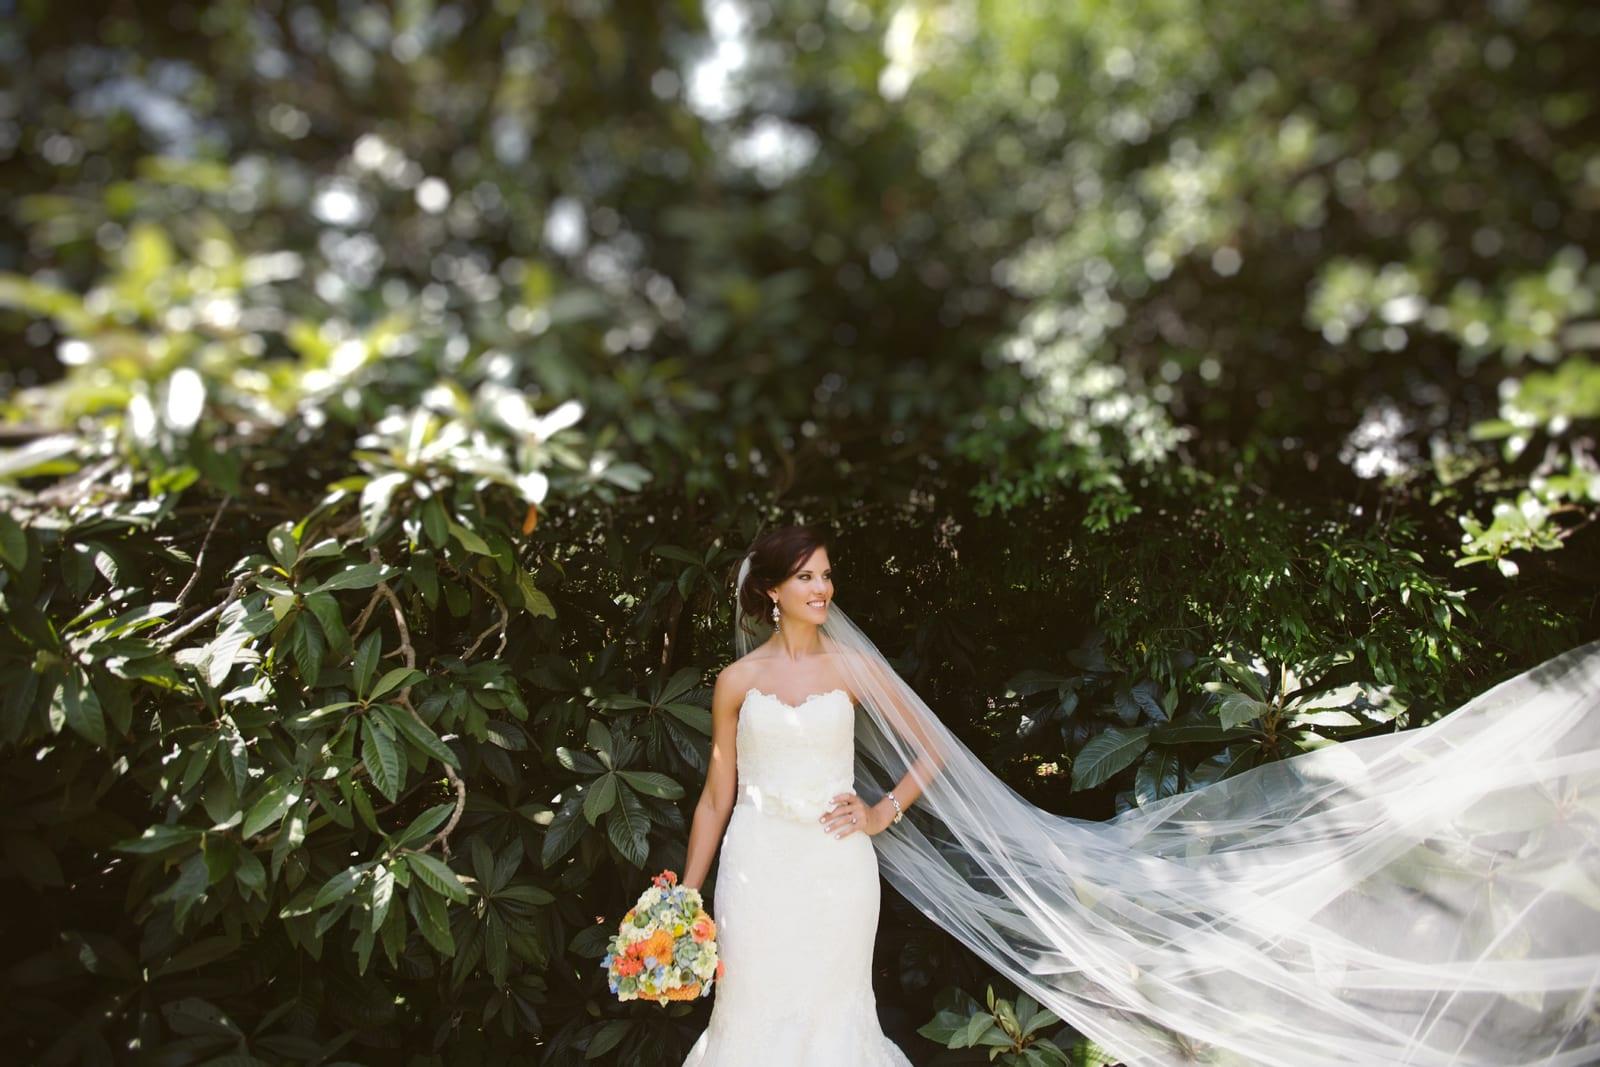 laguna gloria bridal portraits kelly the bird the bear austin destination wedding photographer and videographer